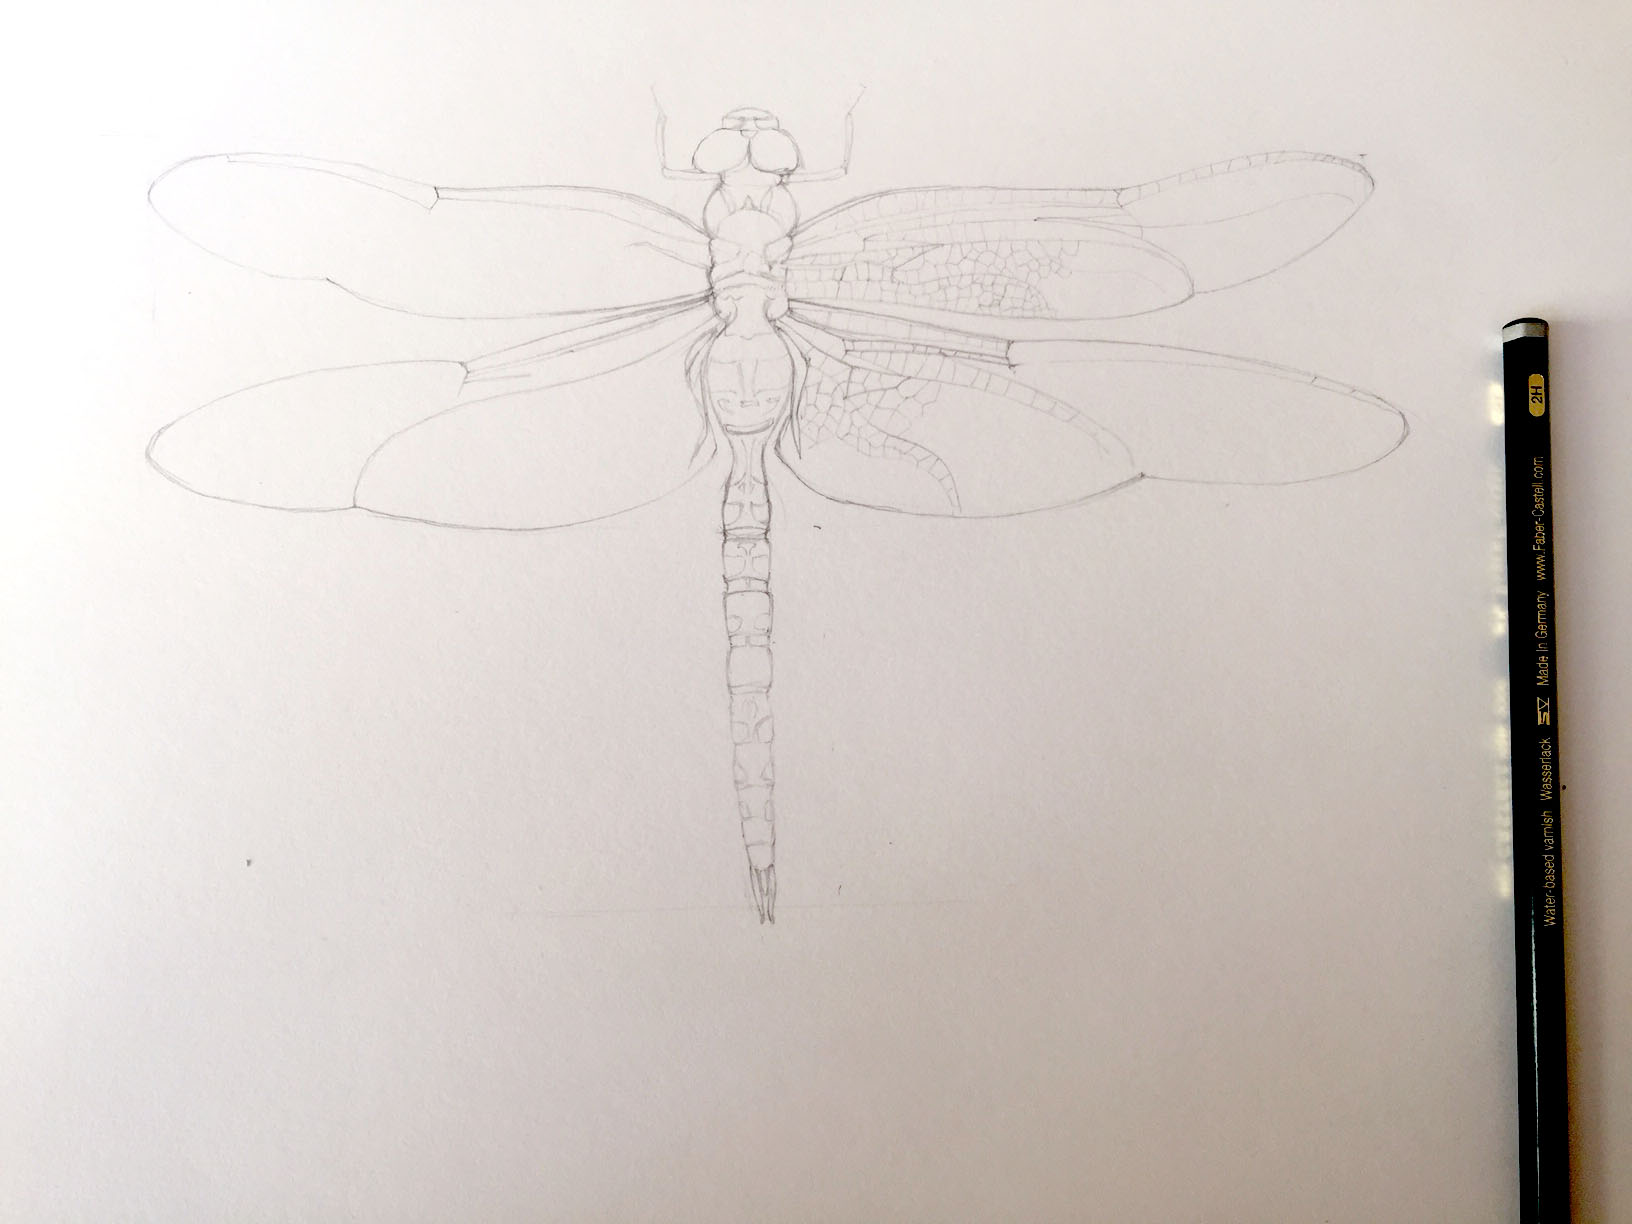 Dragonfly step 01.jpg